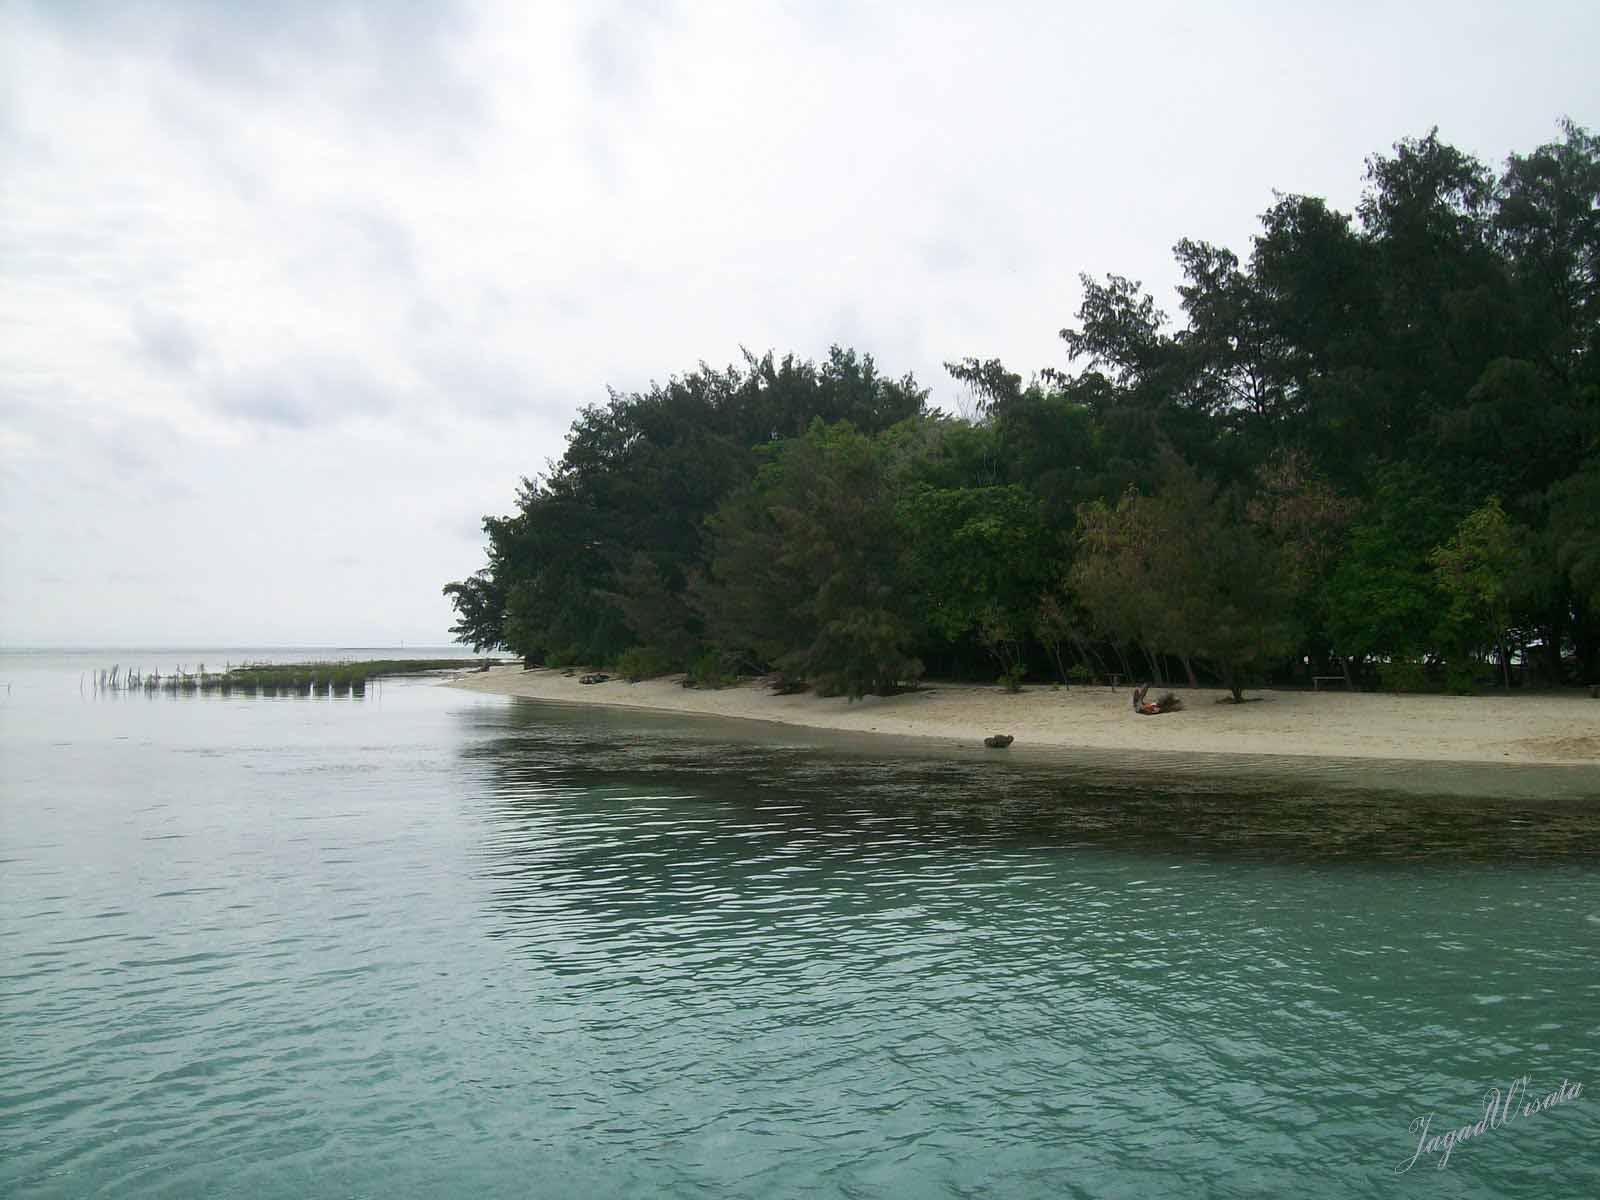 Provinsi Dki Jakarta Nikmati Petualangan Tour Wisata Menjelajahi Indahnya Pulau